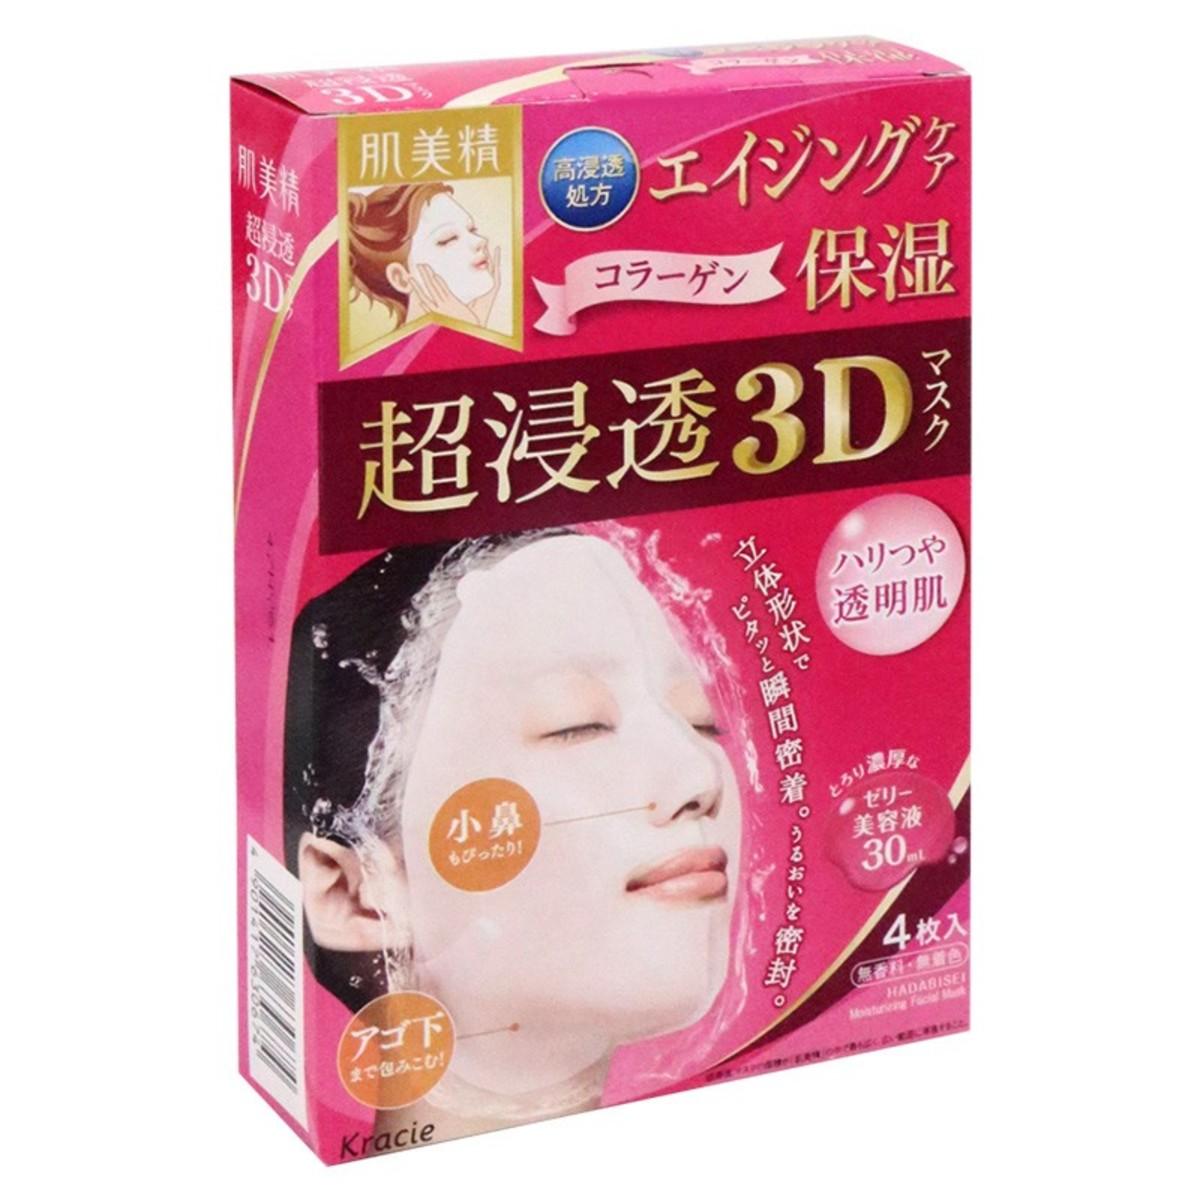 Kracie | Kracie - Kracie Hadabisei 3D Face Mask (Aging-care